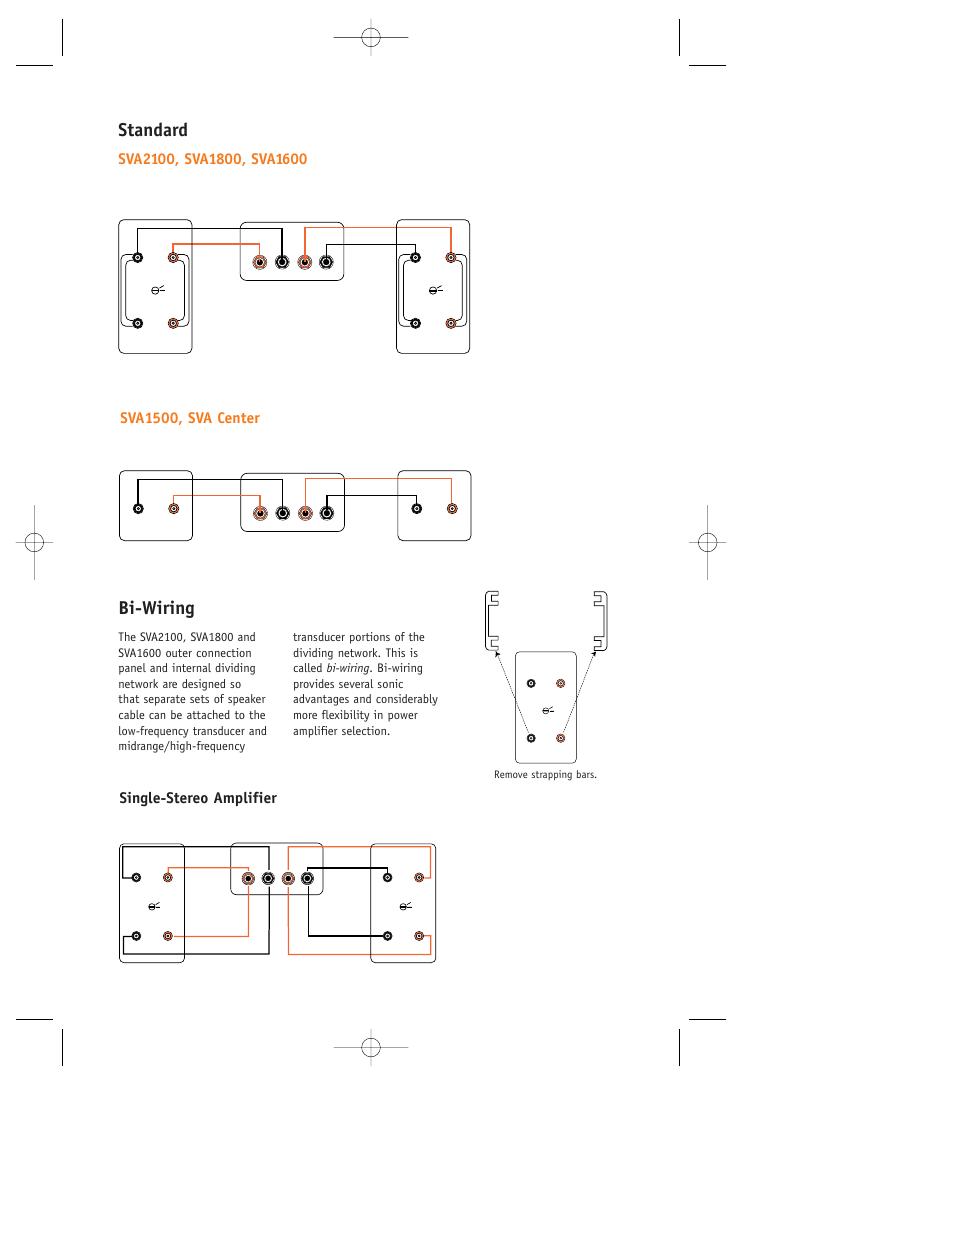 Standard Bi Wiring Sva1500 Sva Center Jbl User Speakers Diagram Manual Page 4 8